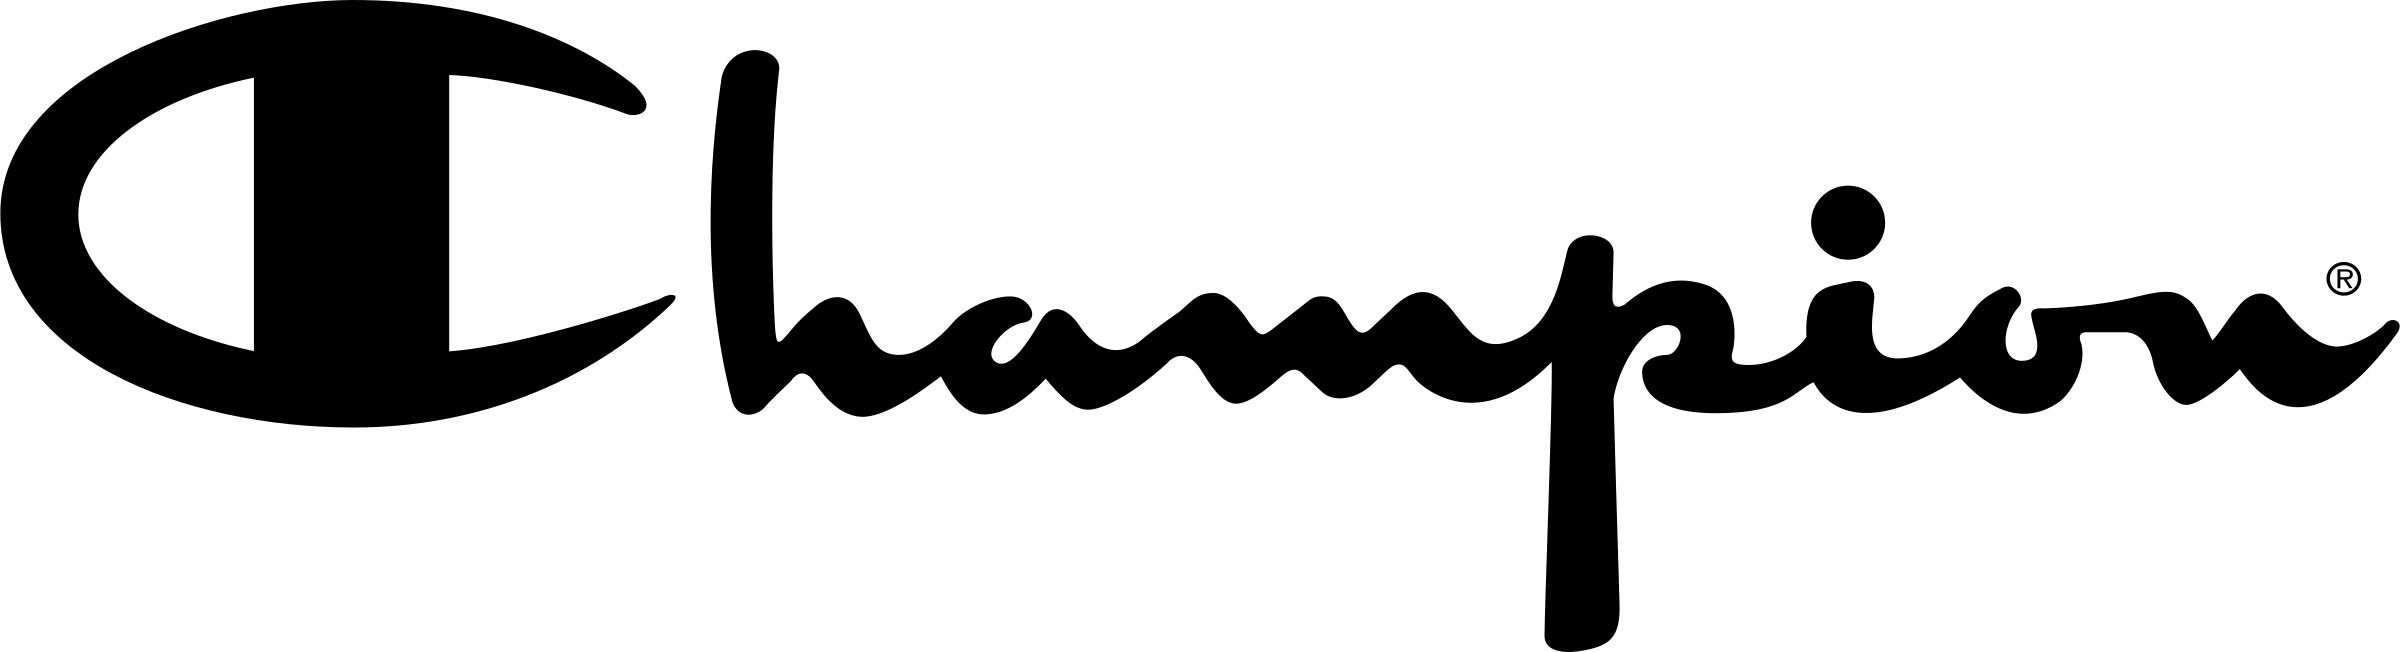 logo_champion.png